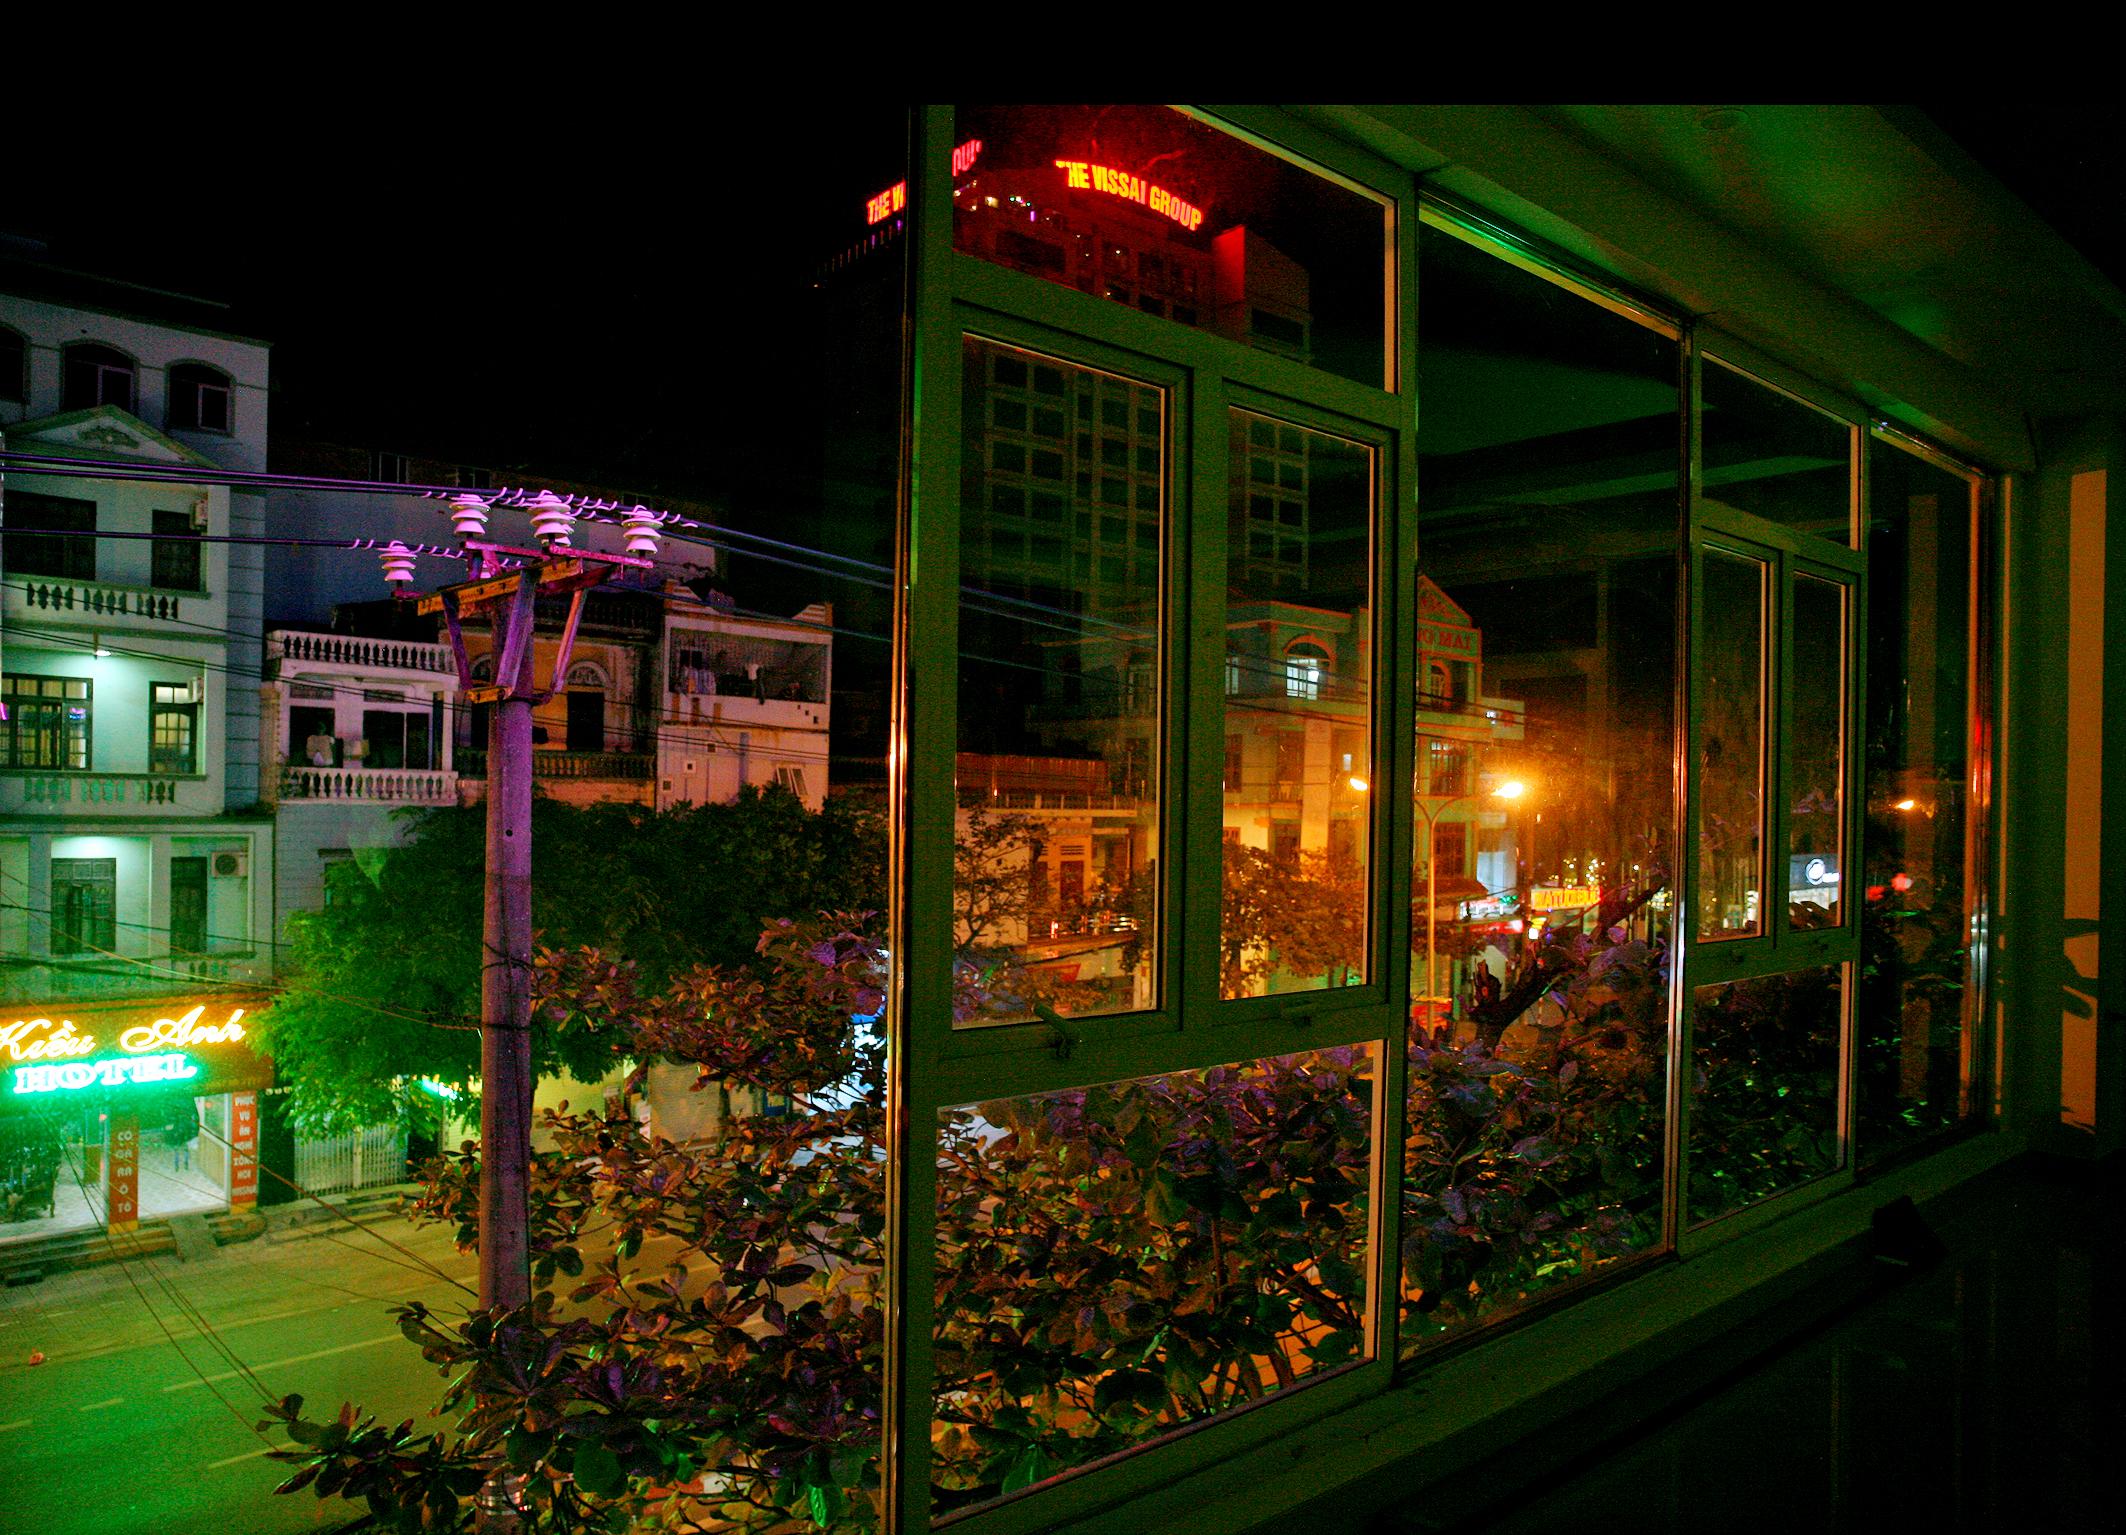 Ninh Binh Central Backpackers Hostel